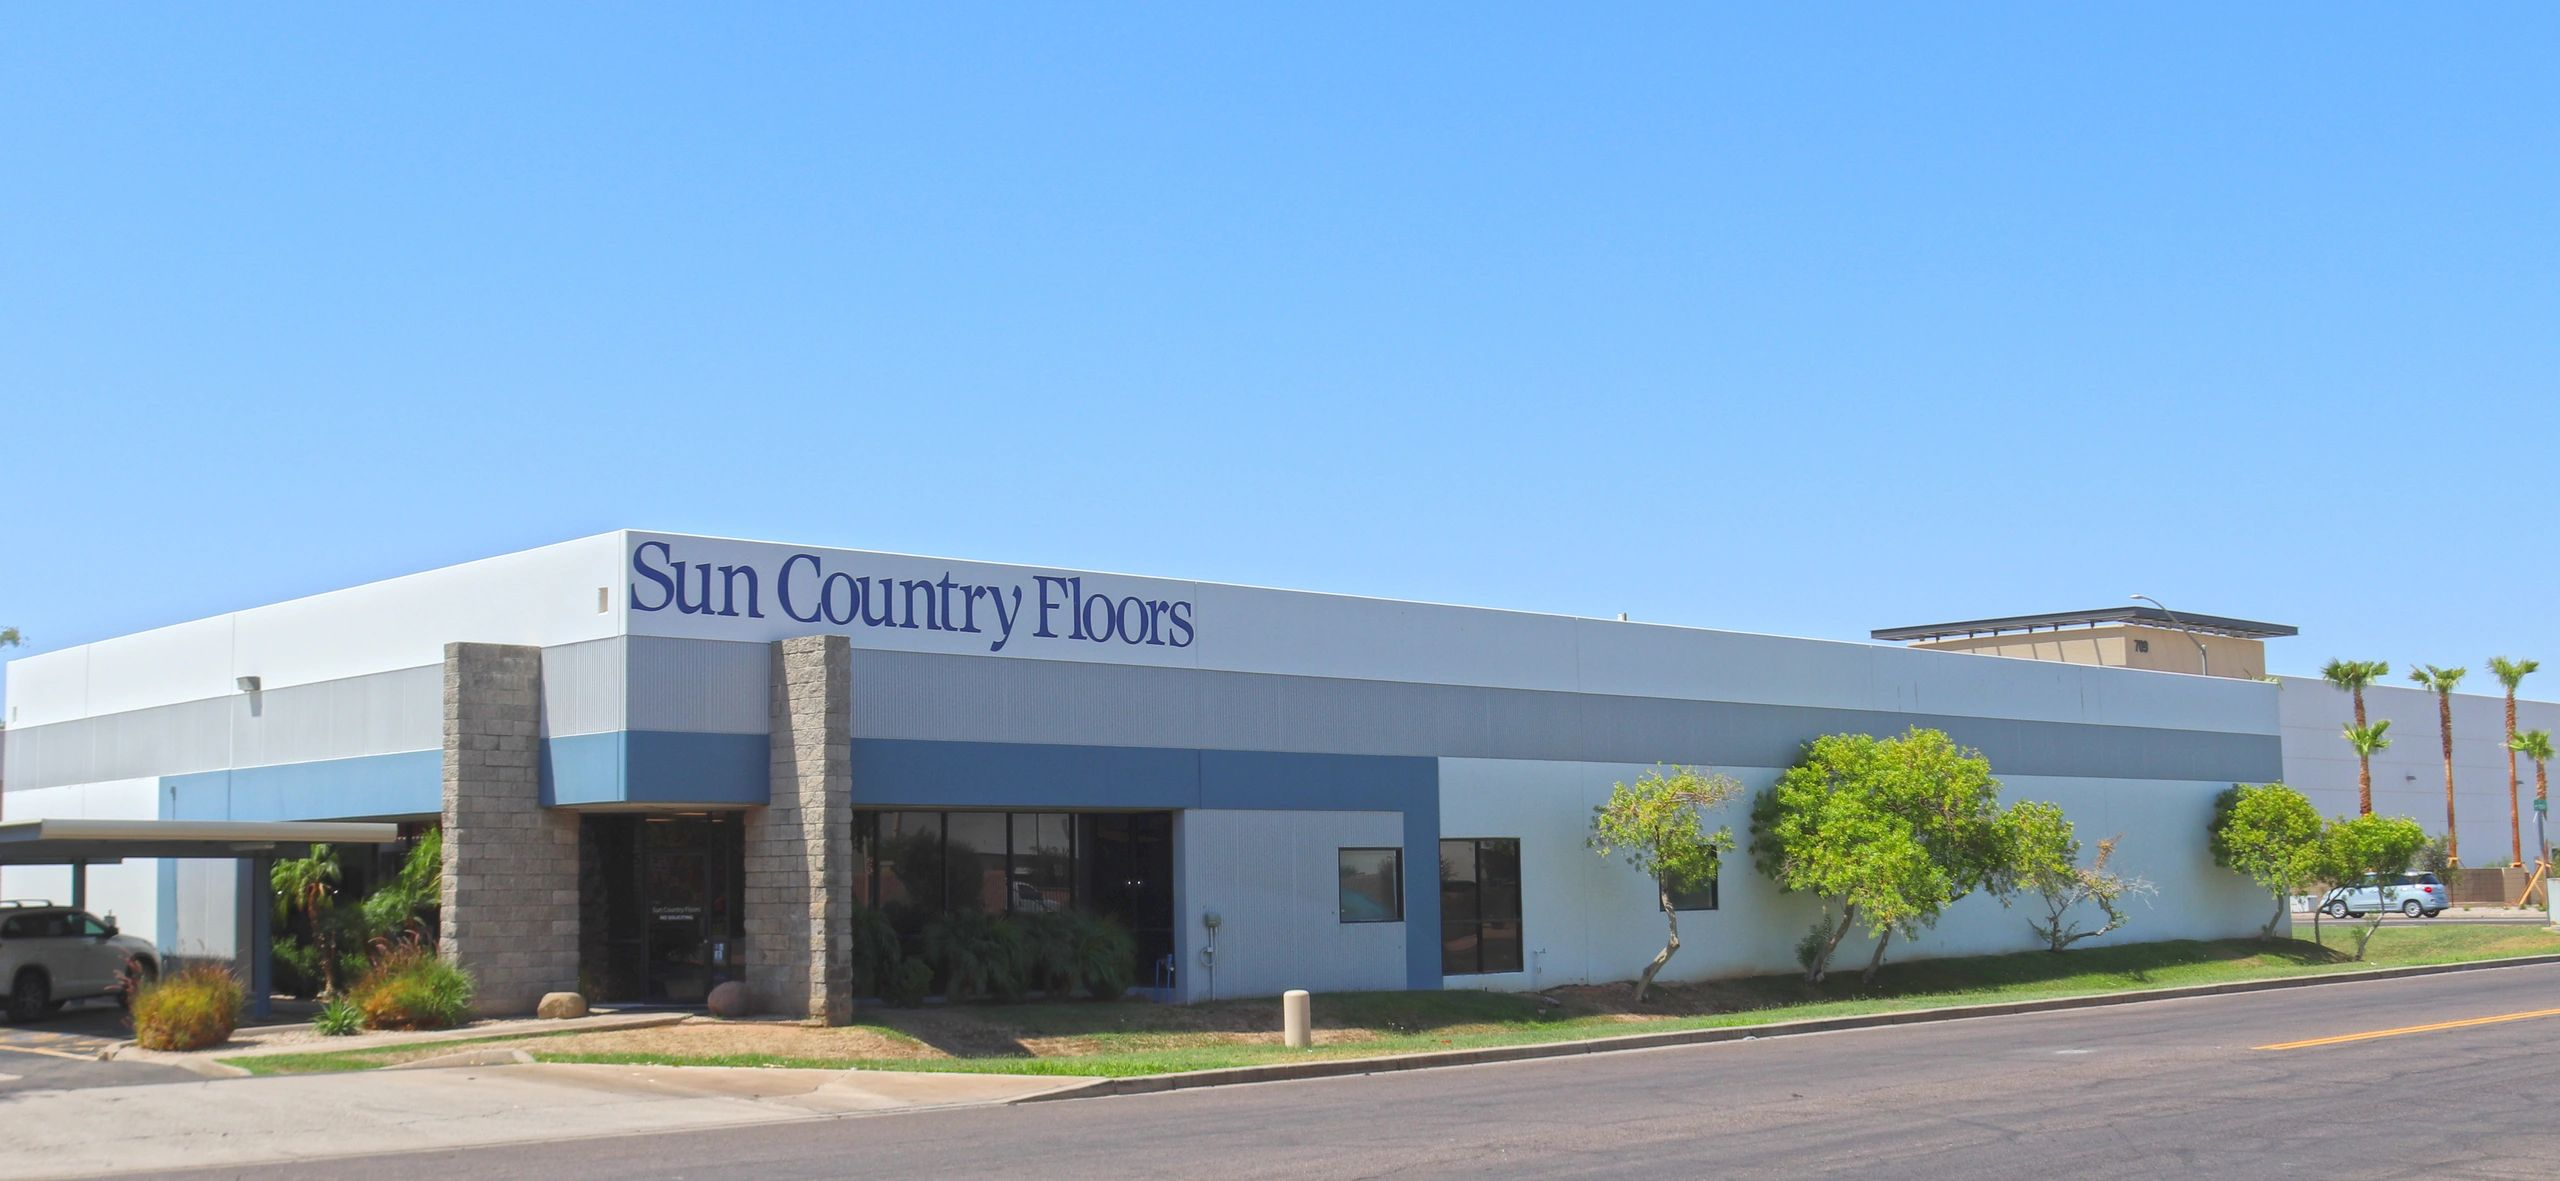 Invoice Sun Country Floors Inc